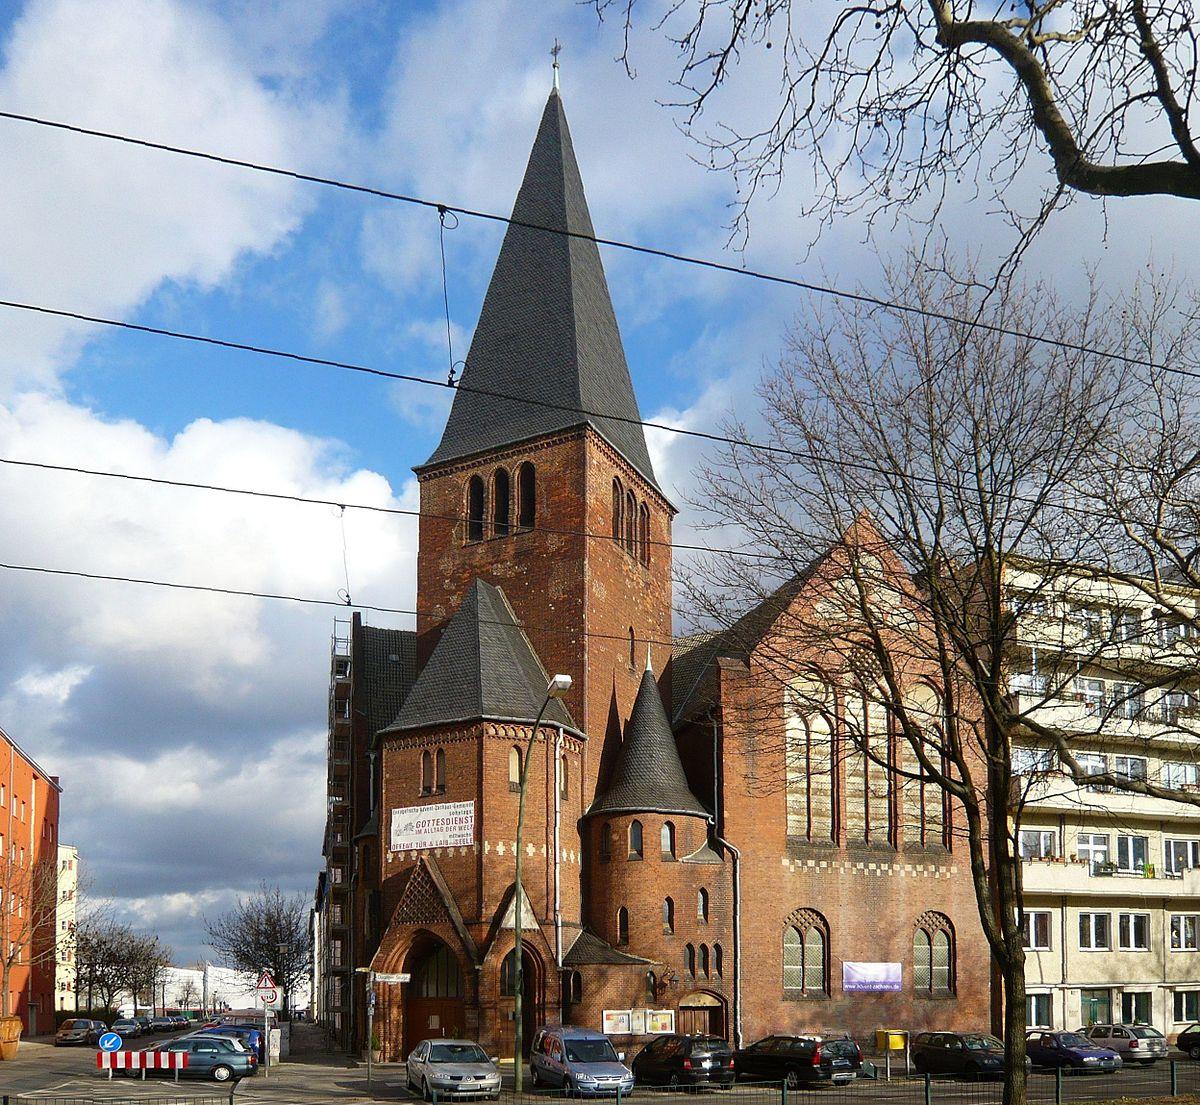 adventkirche berlin wikipedia. Black Bedroom Furniture Sets. Home Design Ideas